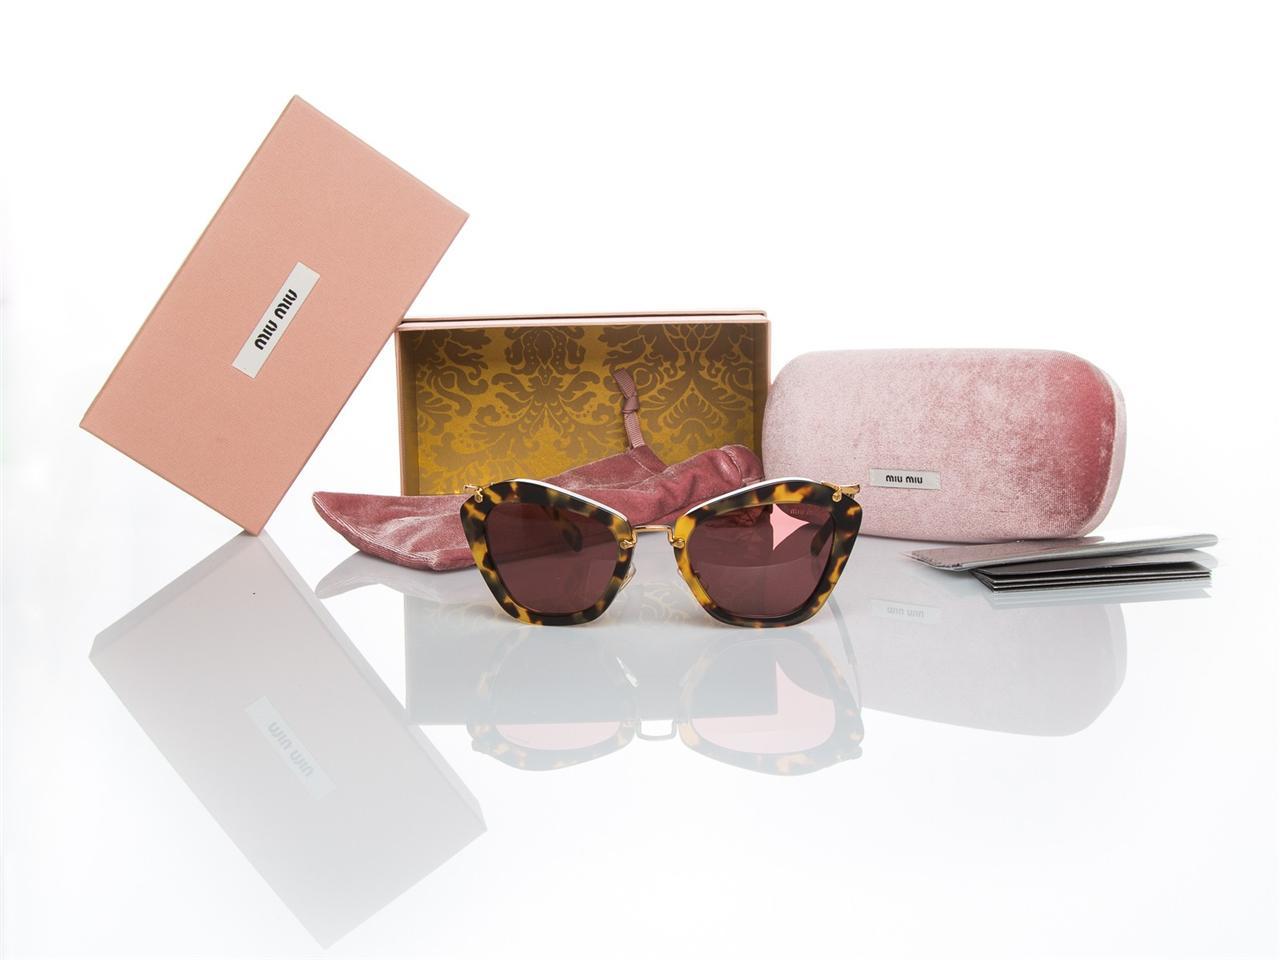 5c02c0863df39 Miu Miu Sunglasses Ebay « Heritage Malta